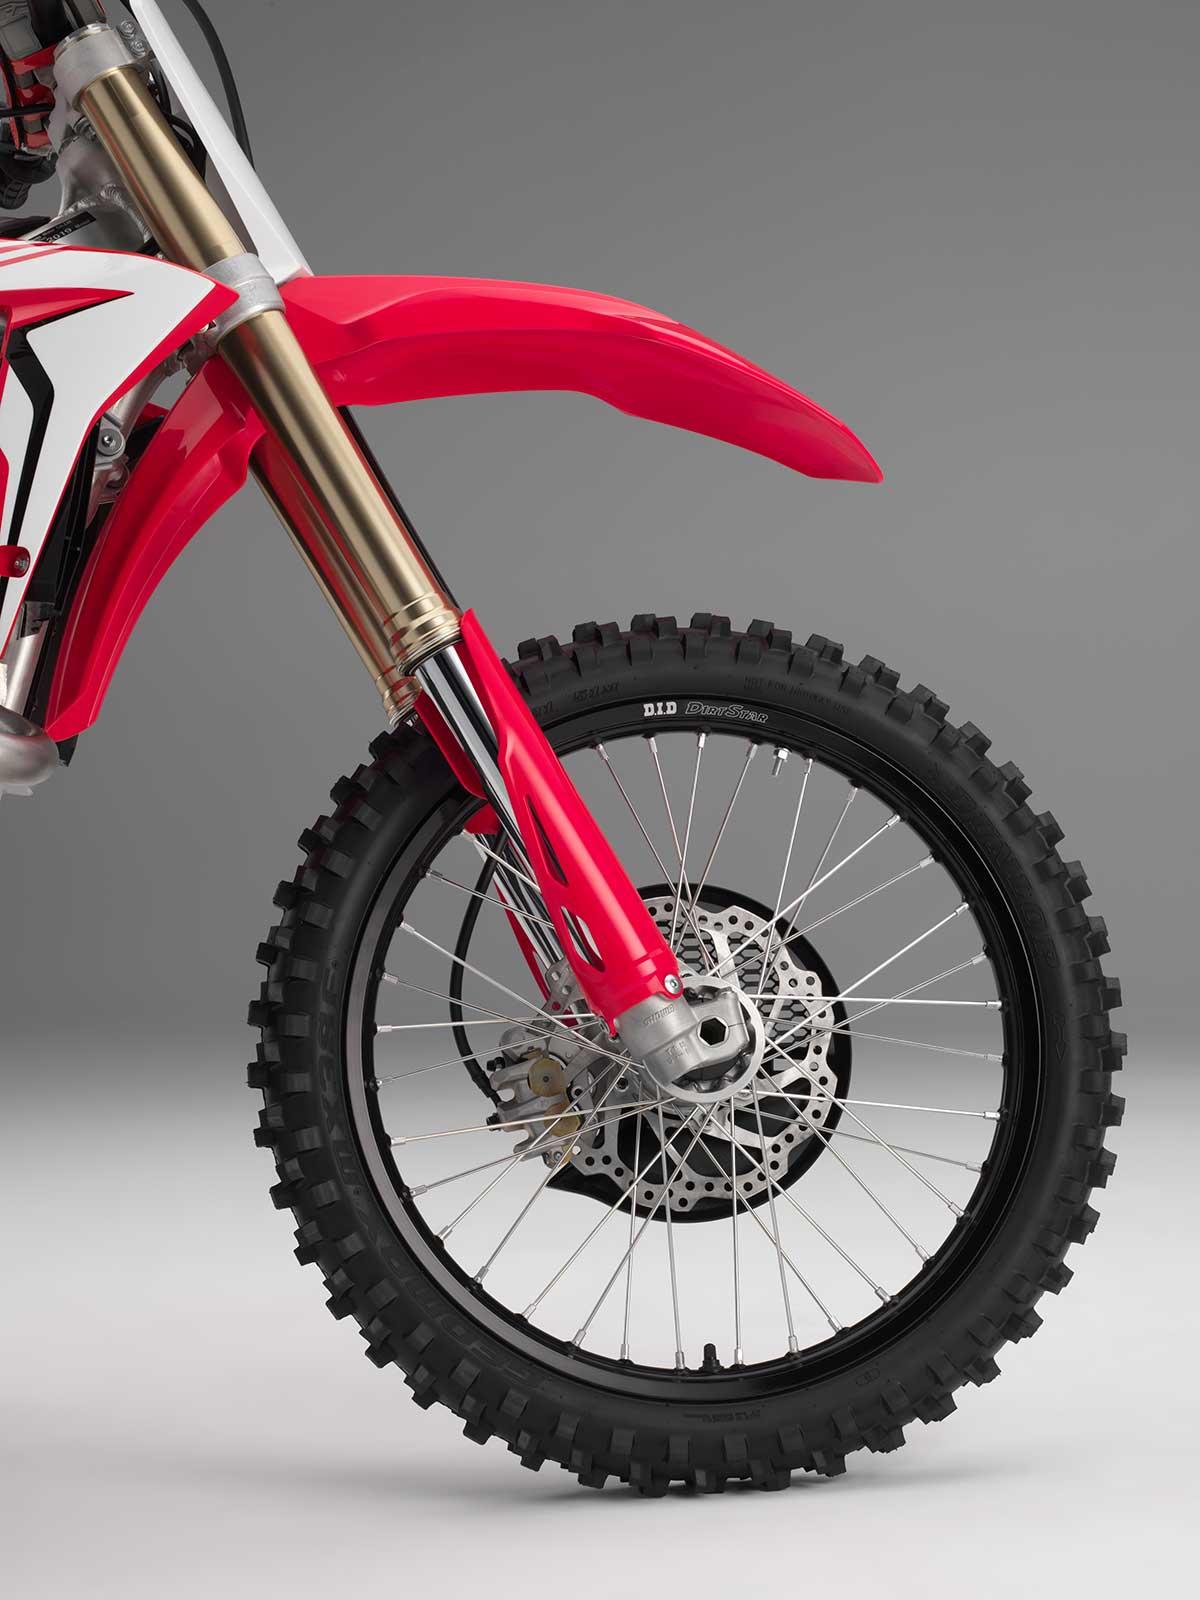 19-Honda-CRF450R_wheel-F.jpg